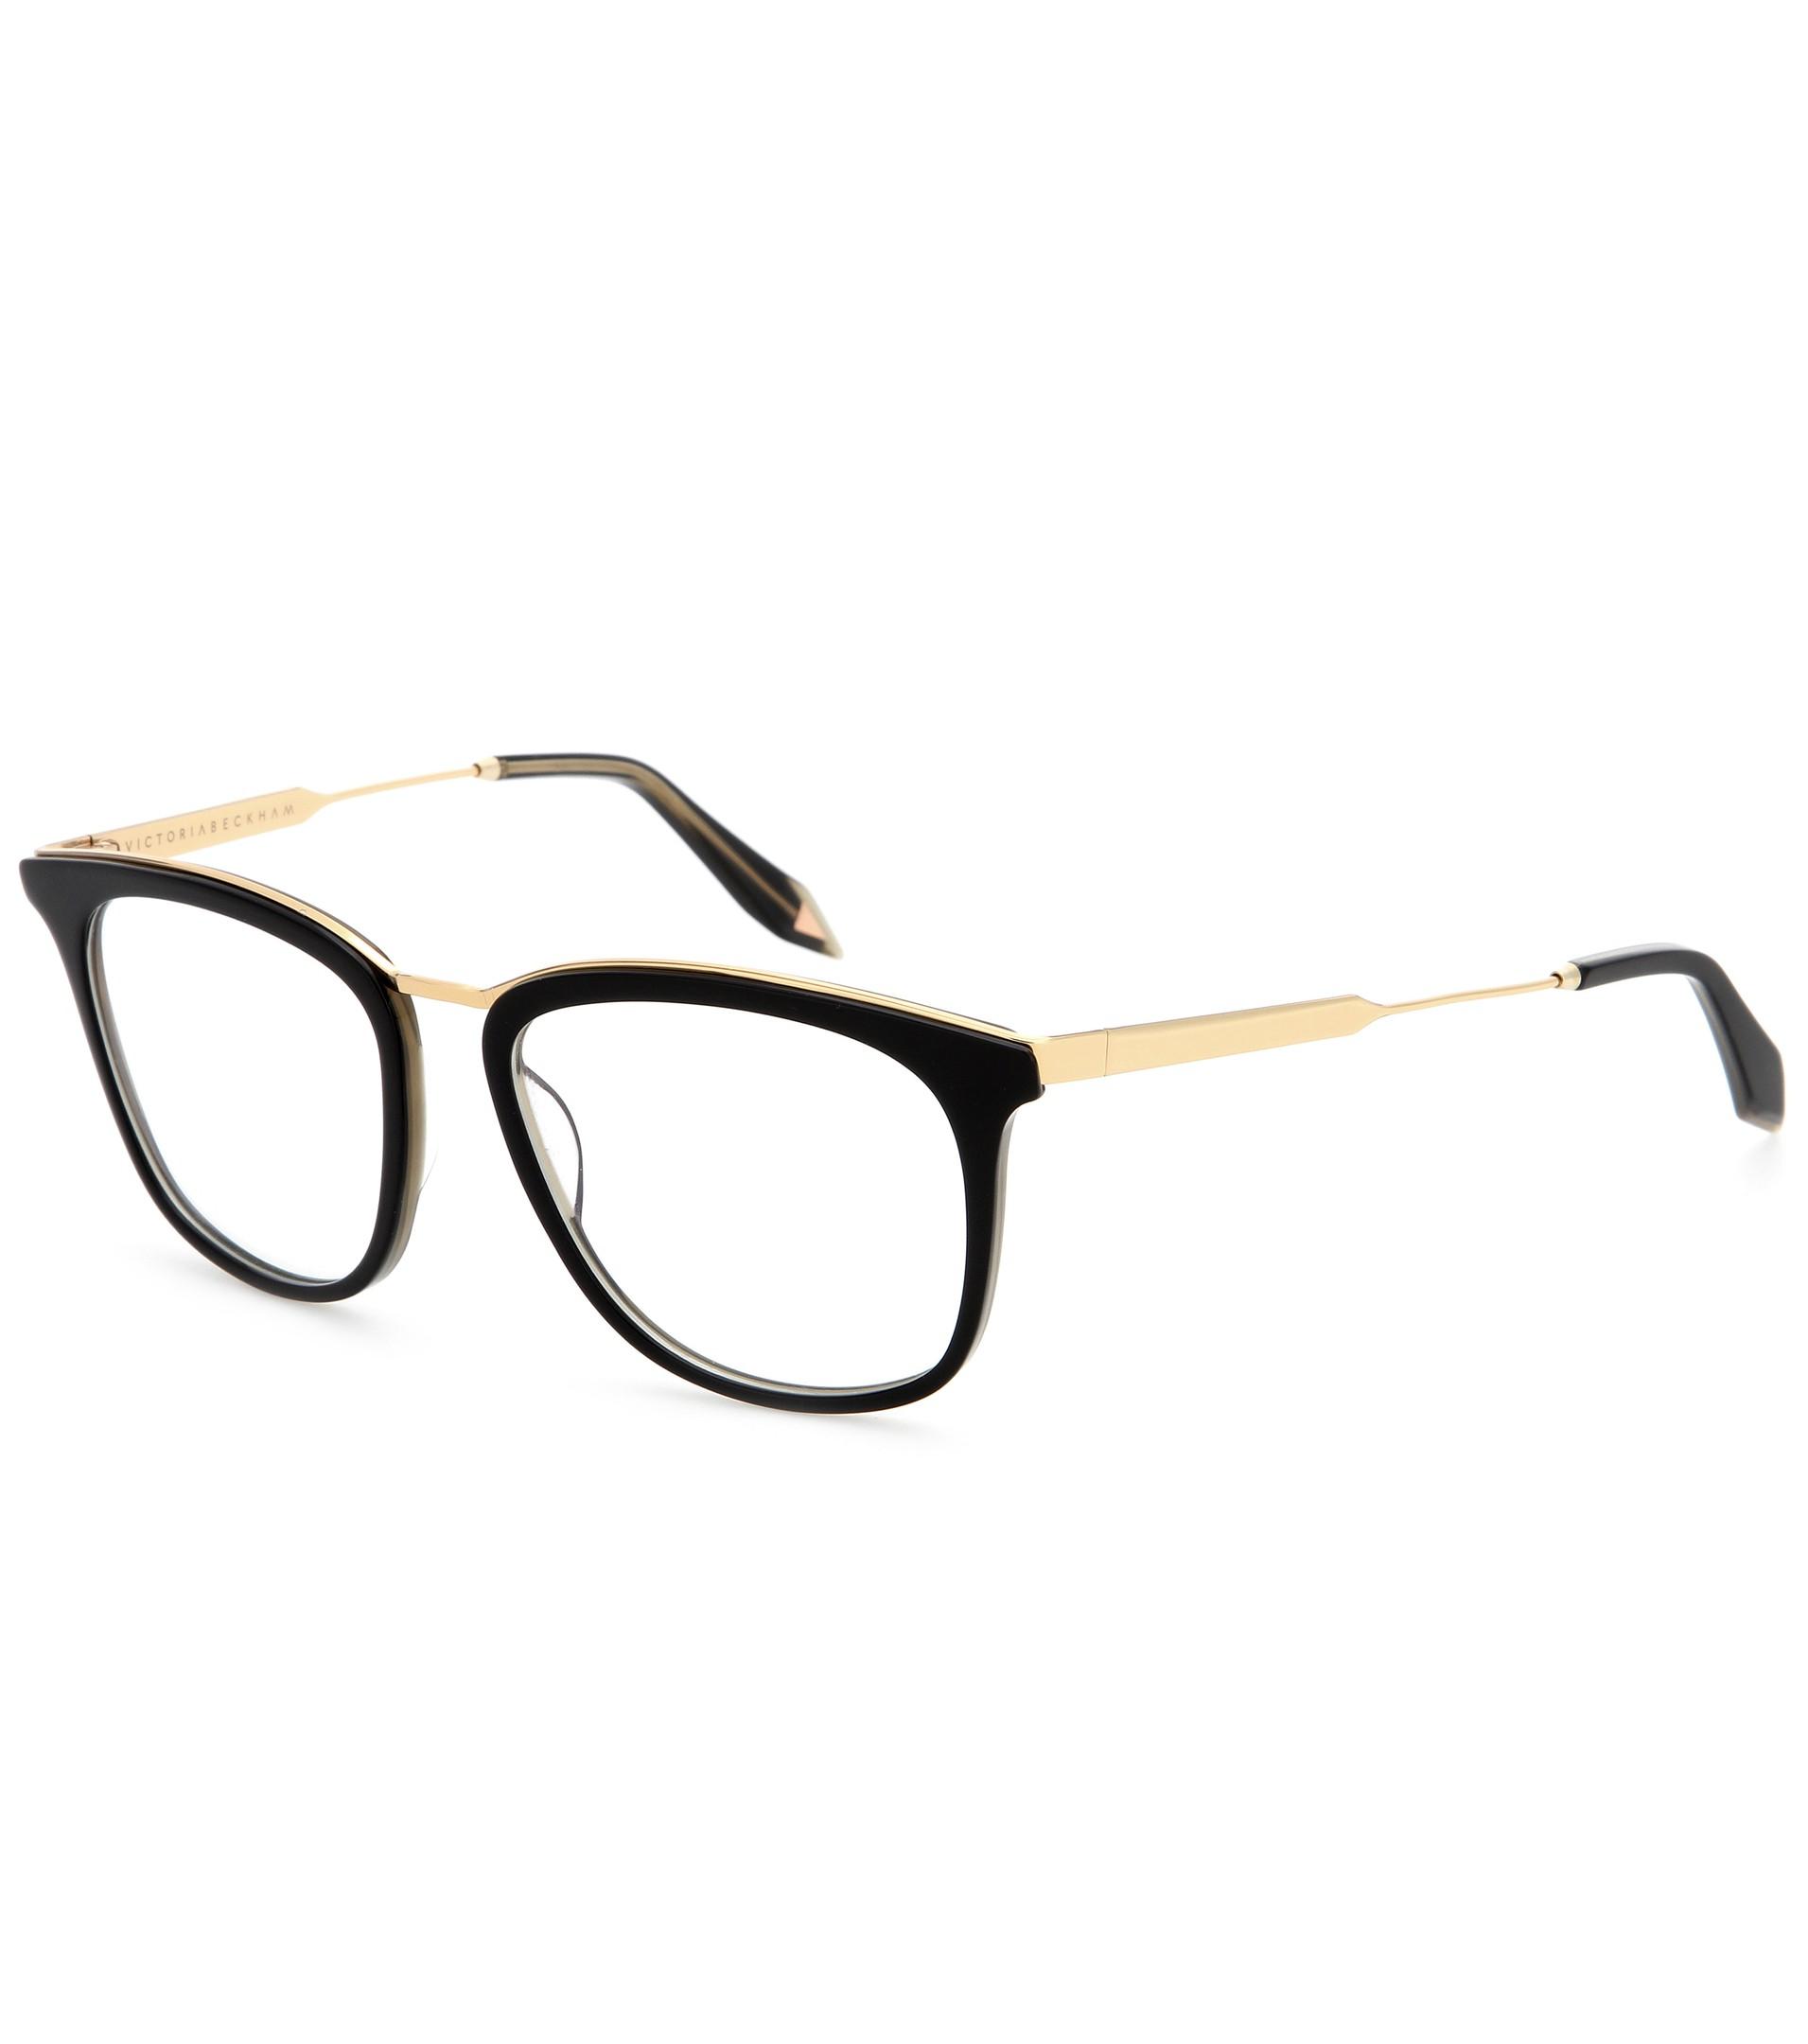 3eeef2d4ce Lyst - Victoria Beckham Ponte Fine D Frame Optical Glasses in Green